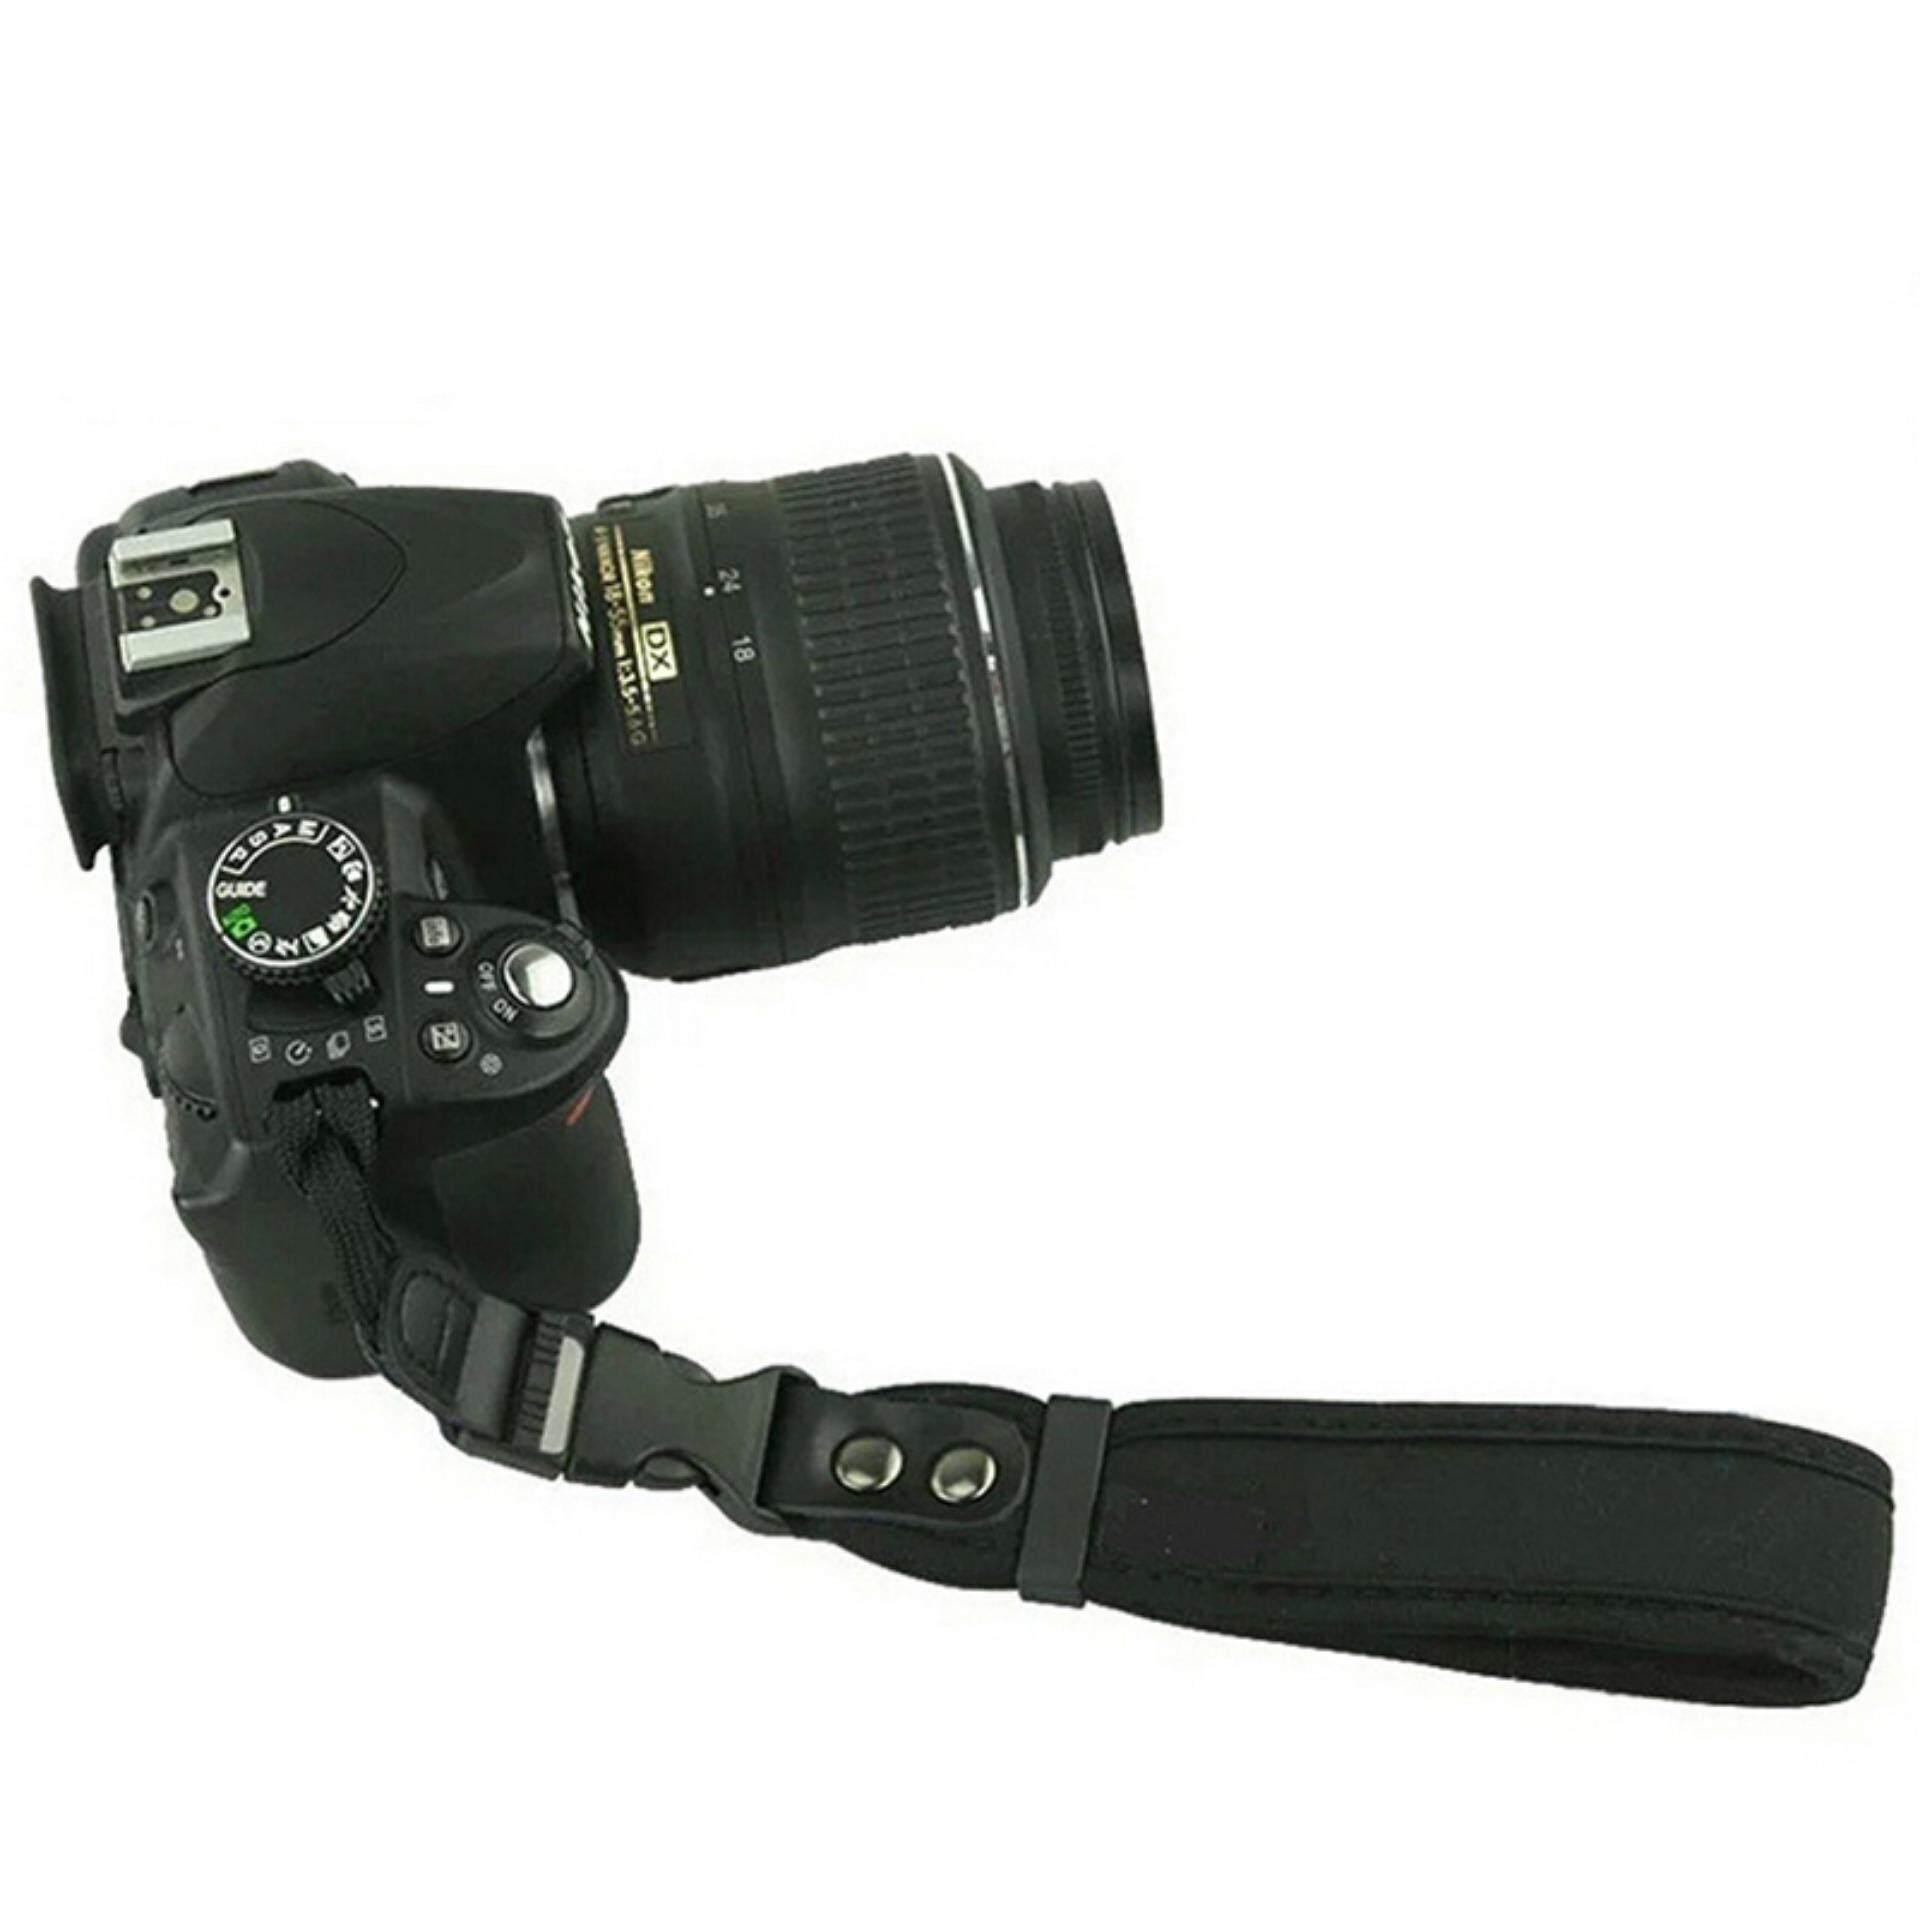 Kamera Pegangan Tangan untuk Canon EOS Nikon Sony Olympus SLR/DSLR Kain Strap Pergelangan Tangan